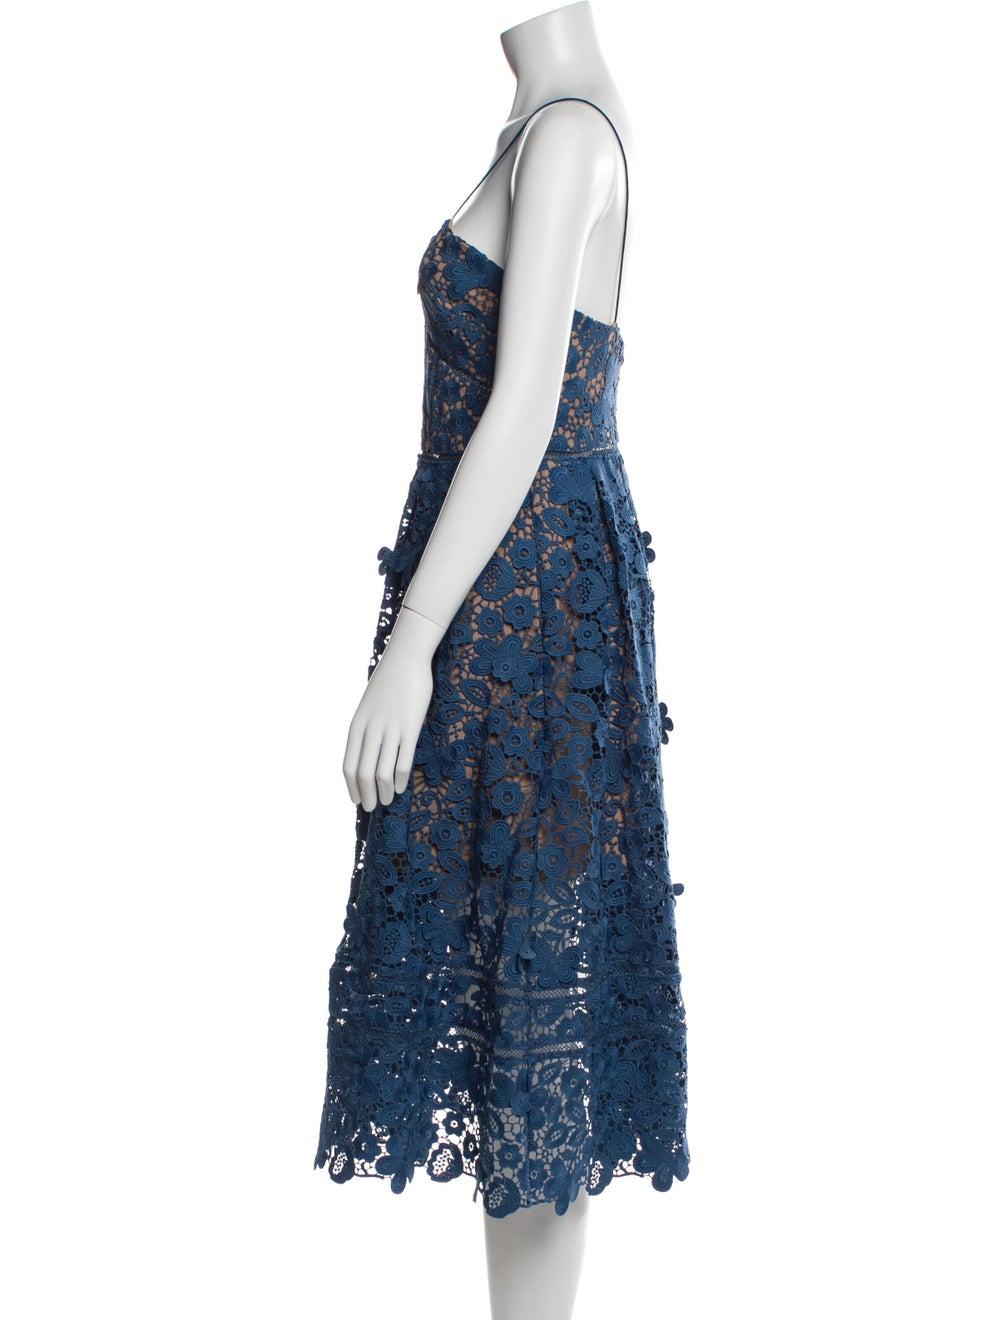 Self-Portrait Lace Pattern Midi Length Dress Blue - image 2